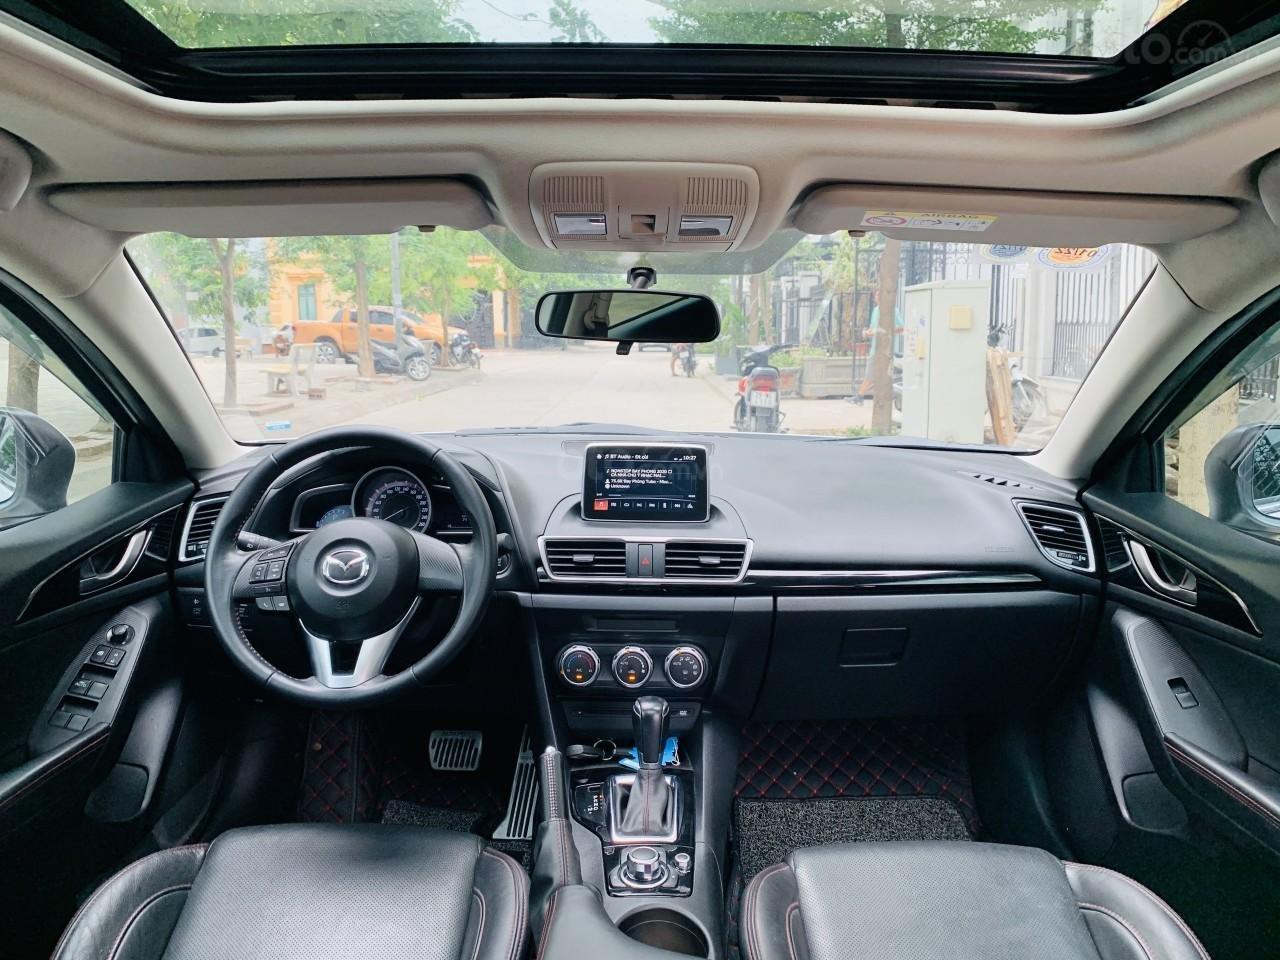 Bán Mazda 3 HB 1.5AT sản xuất 2015 (7)